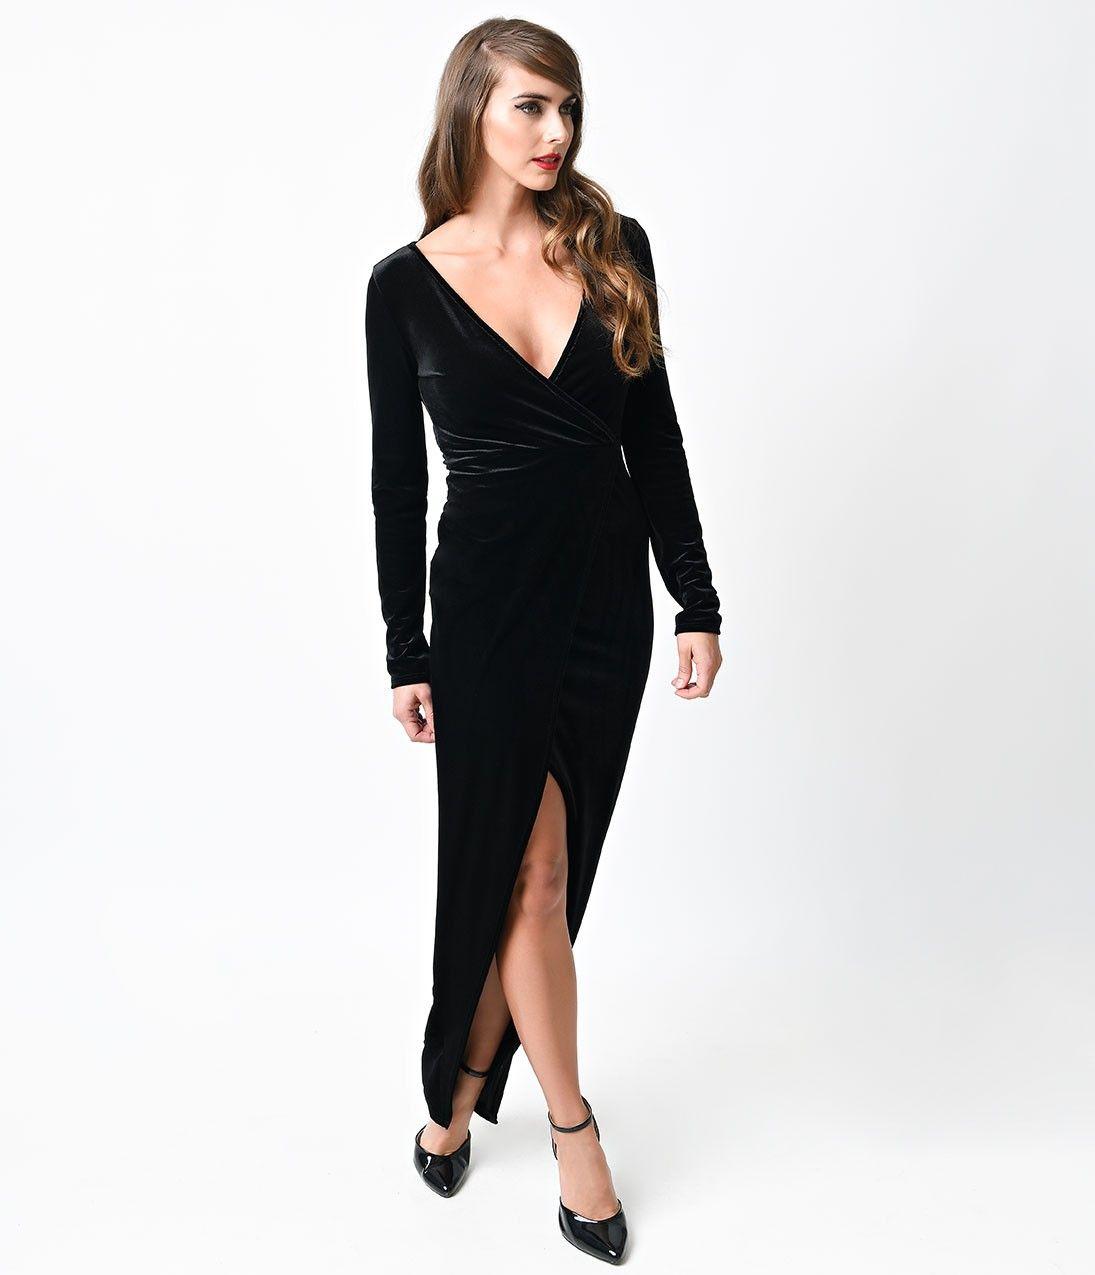 S style black velvet long sleeve maxi wrap dress all the